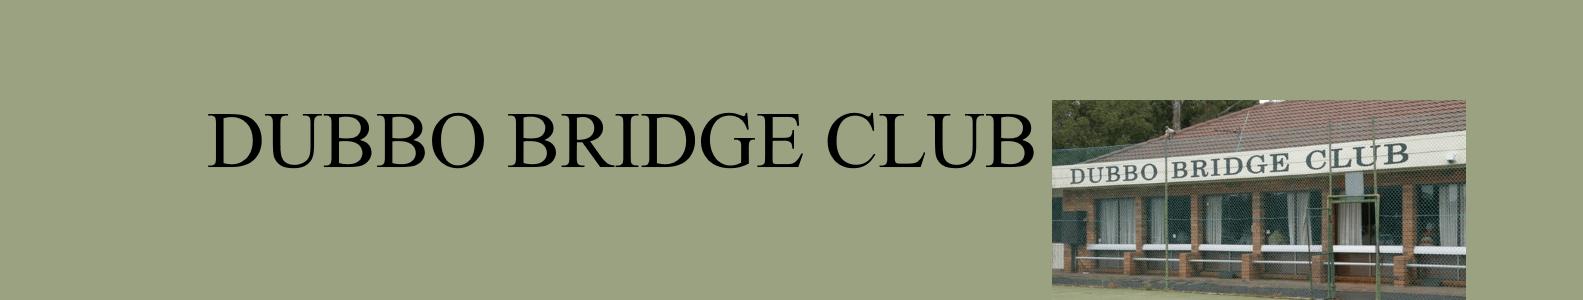 How to Enter Dubbo Bridge Club Pairs Games